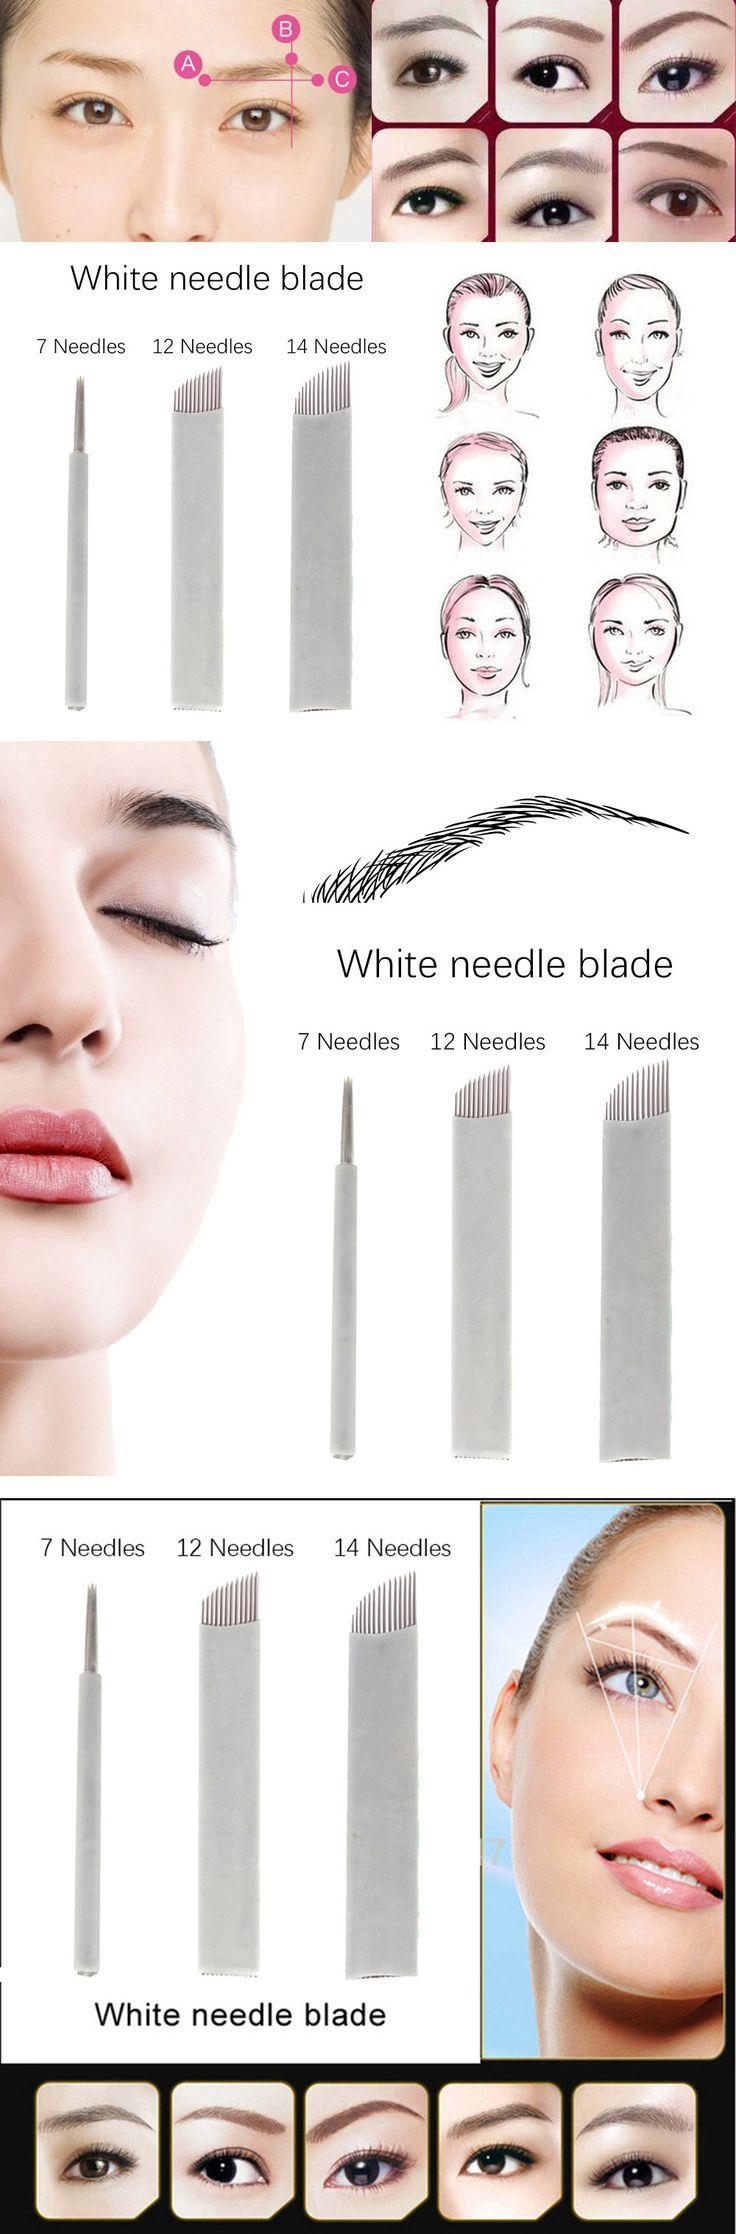 Permanent Microblading Eyebrow Tattoo Needle Manual Makeup Blade 7 Sloped Needles